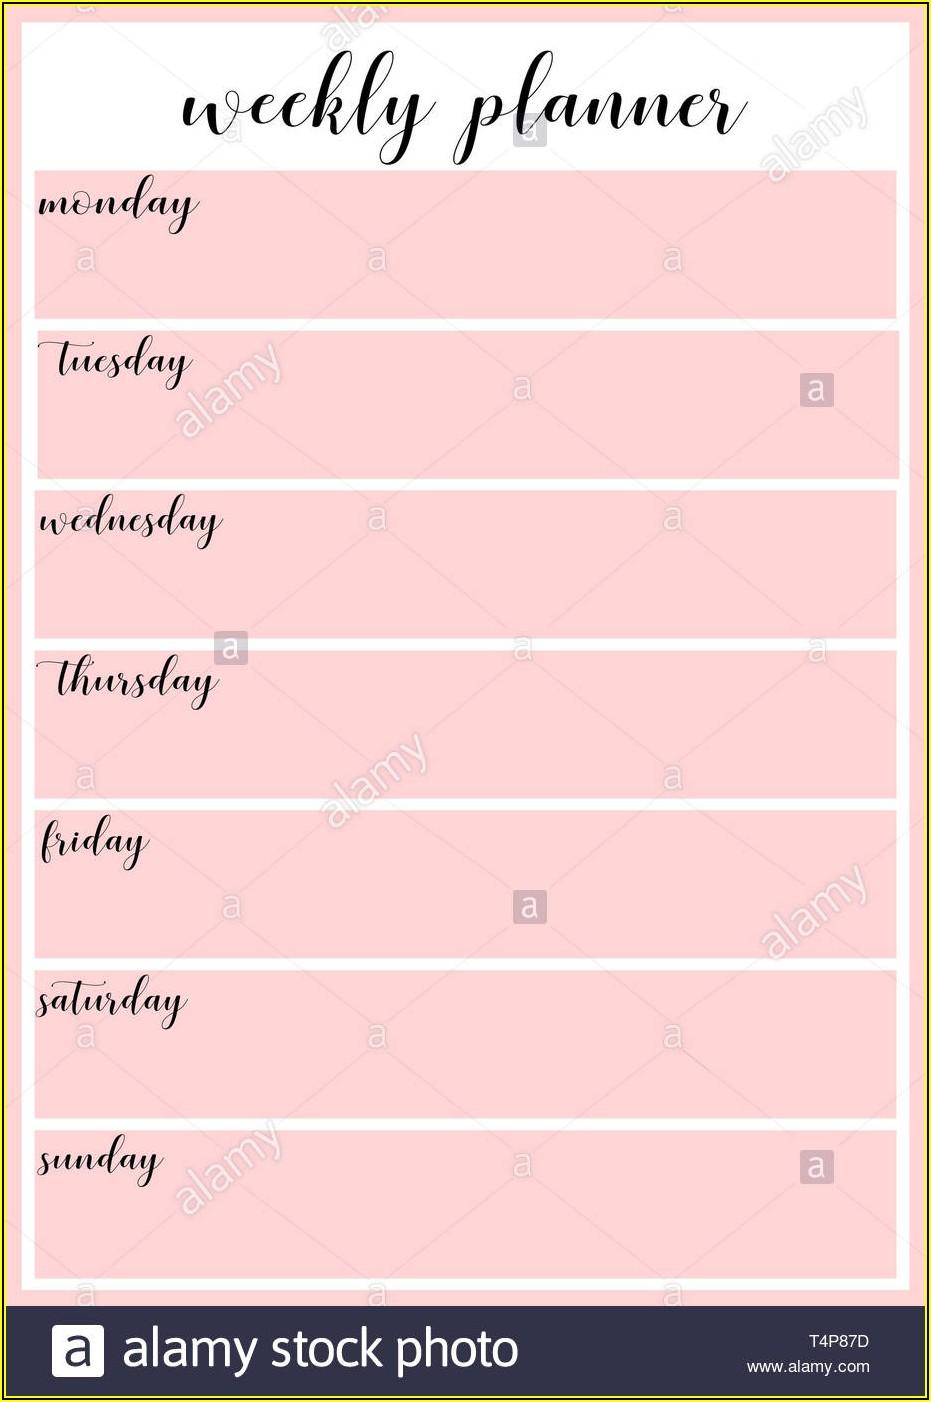 Weekly Schedule Planner Template